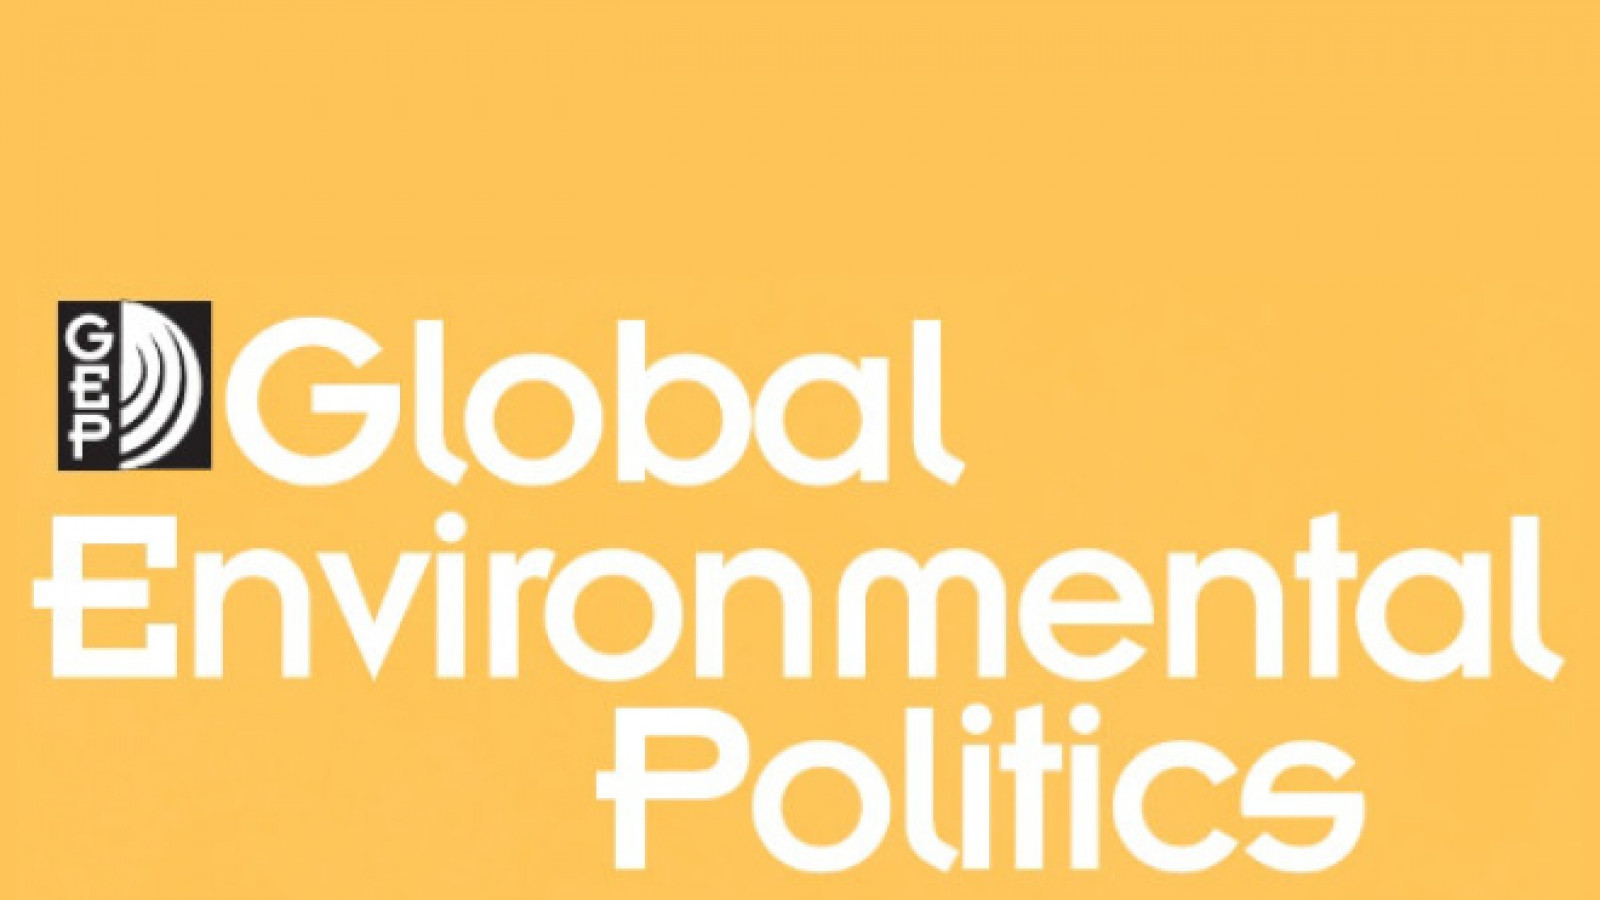 The logo of the journal Global Environmental Politics